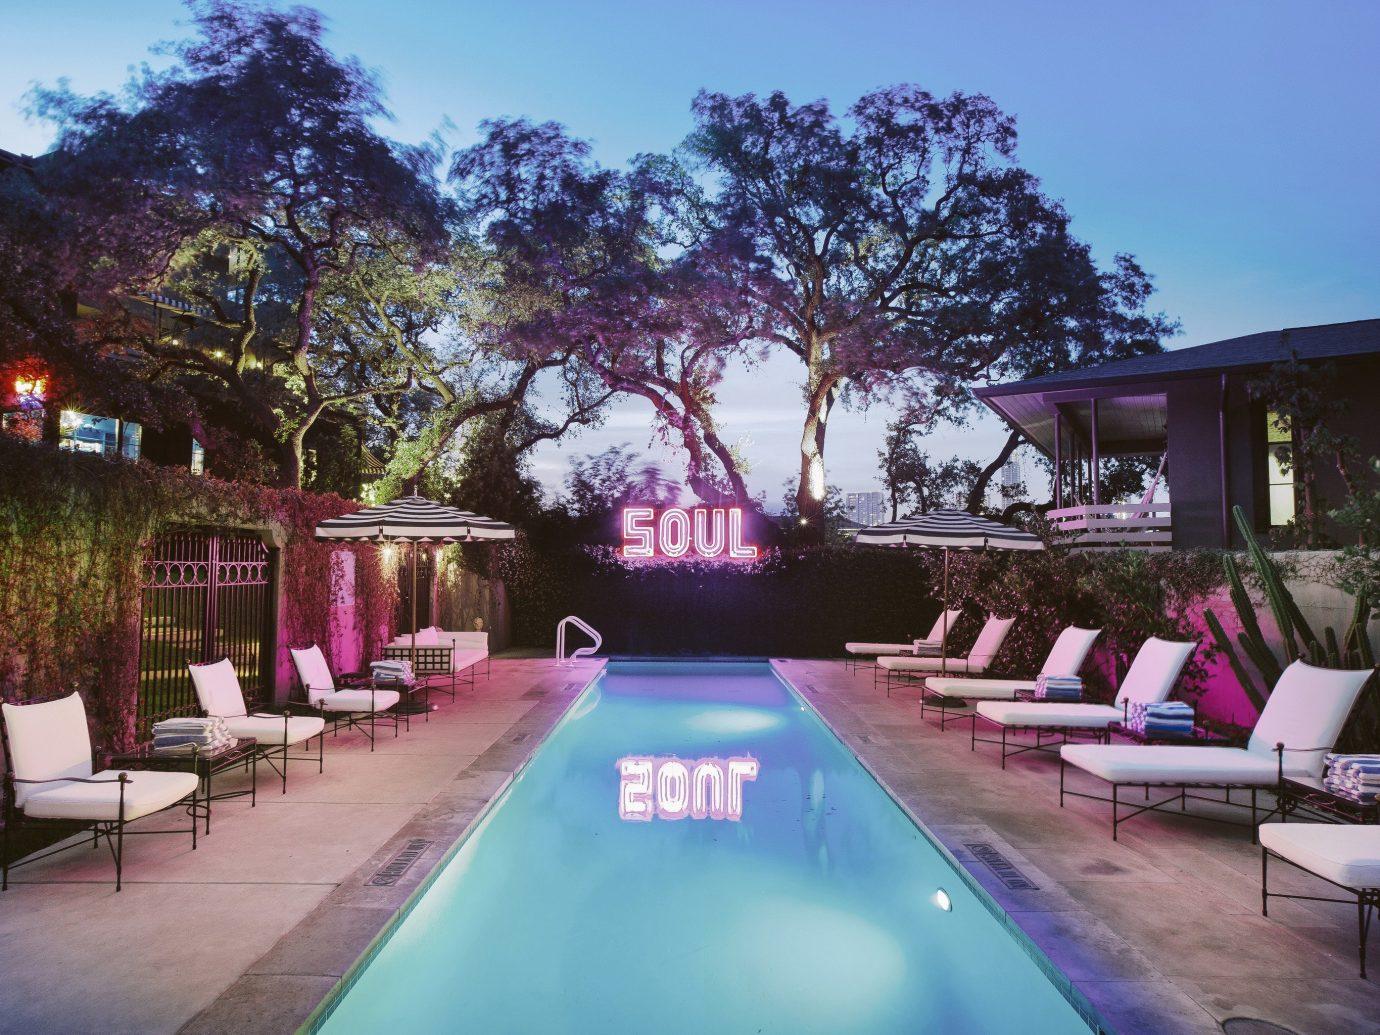 Trip Ideas tree sky outdoor building property swimming pool leisure estate Resort Villa backyard home hacienda mansion real estate